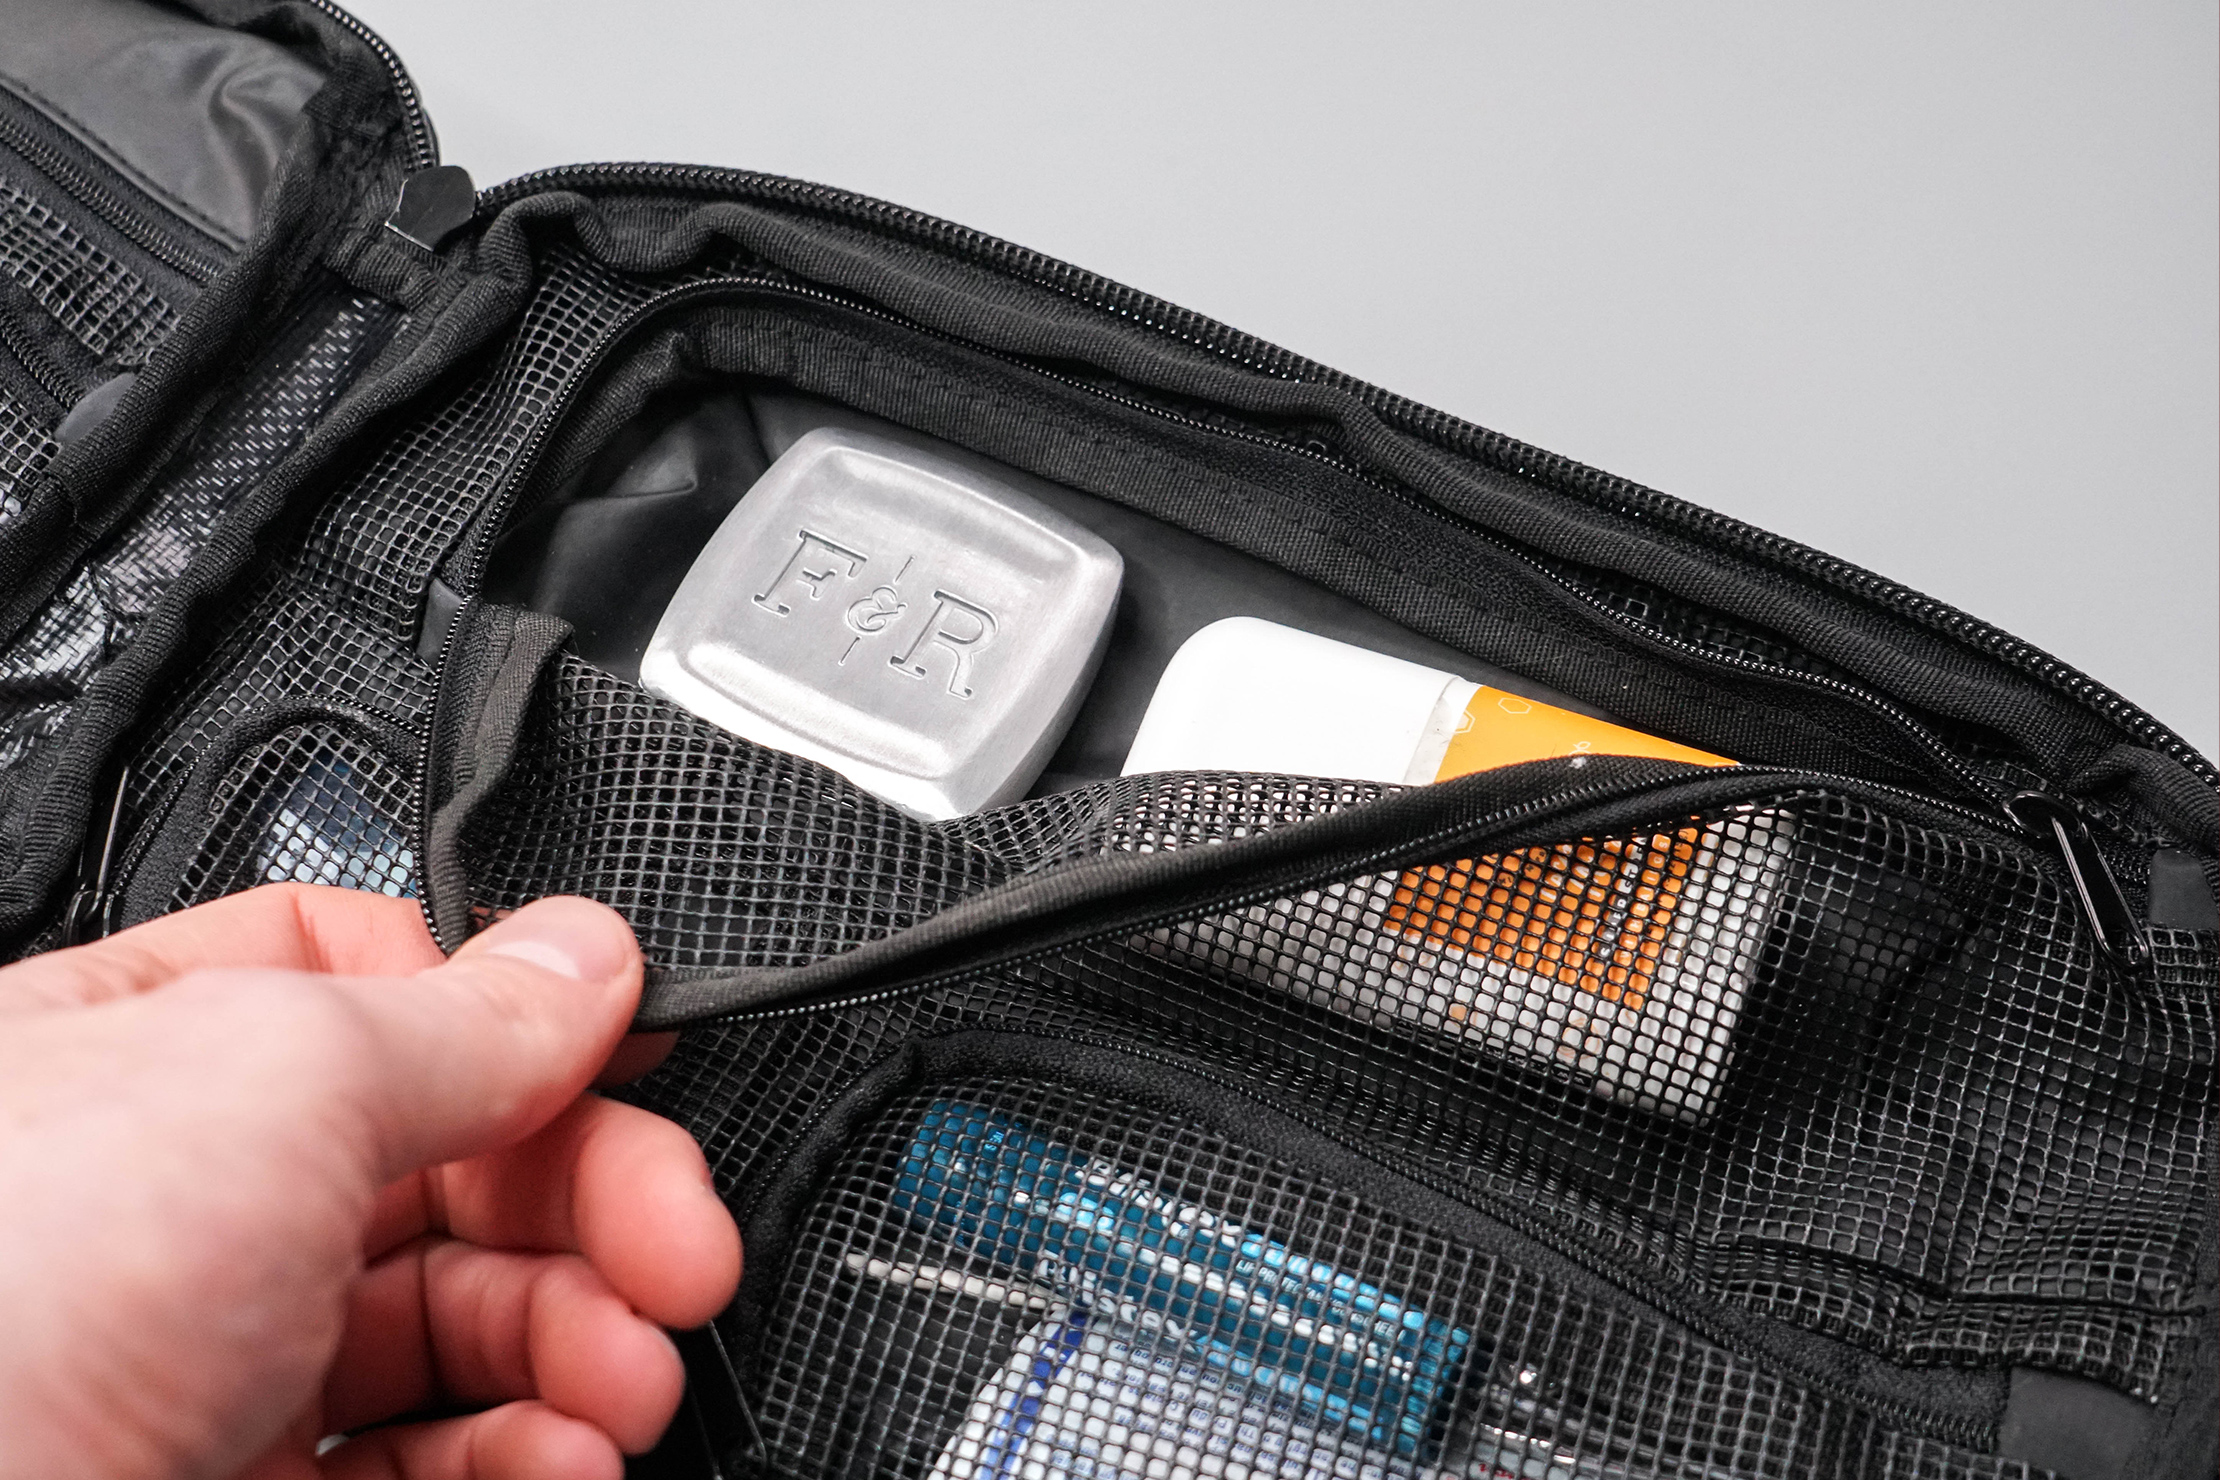 Gravel Explorer Plus Toiletry Bag Deodorant